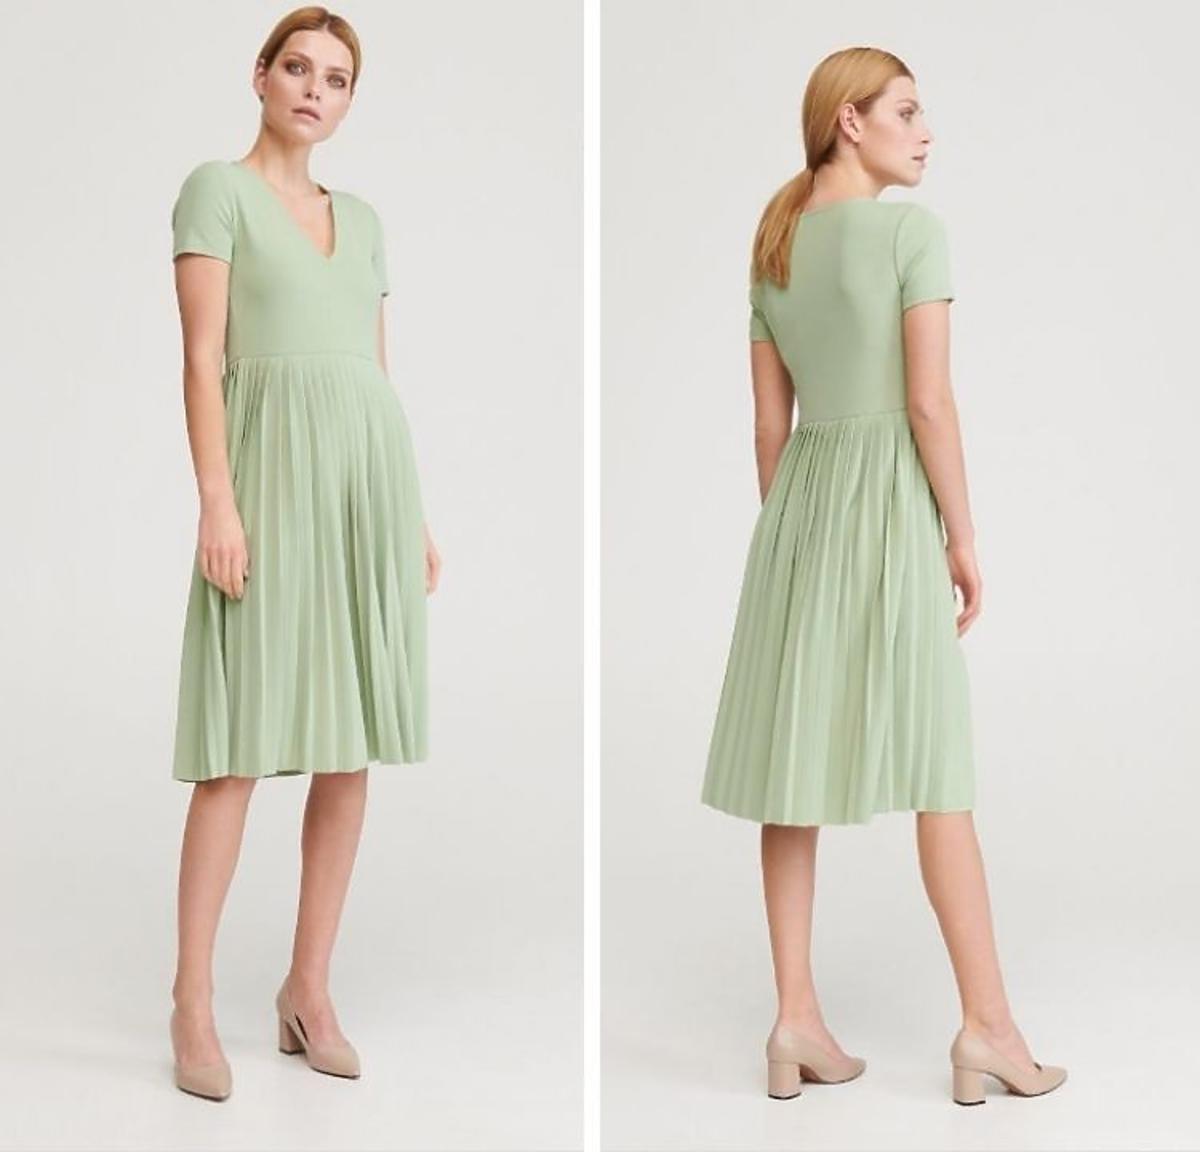 Pastelowa sukienka plisowana z Reserved